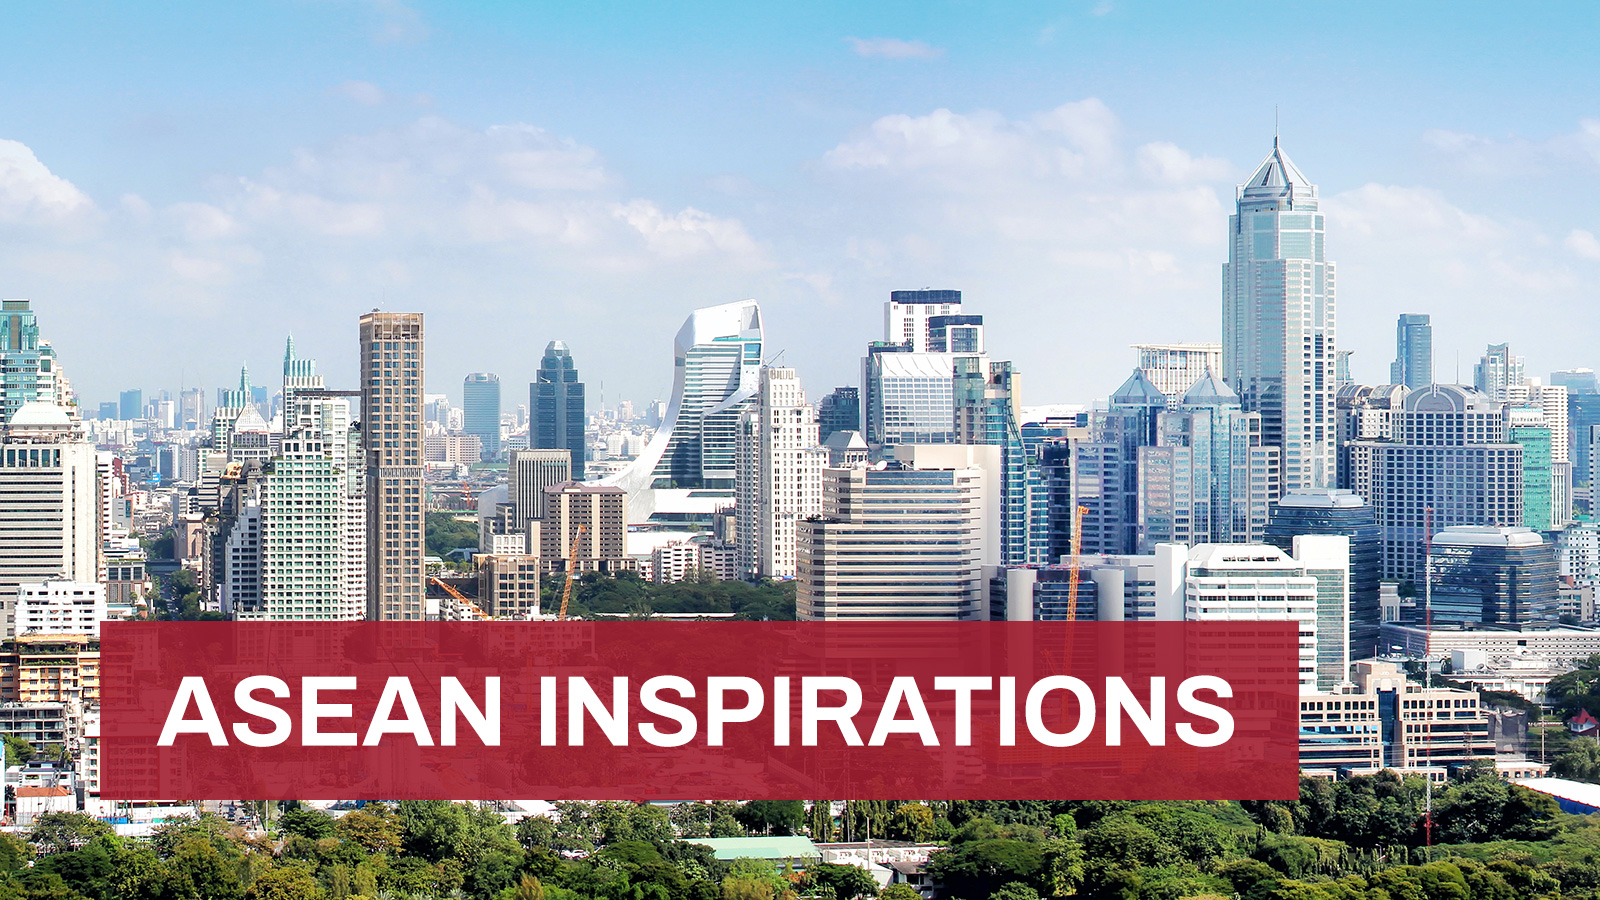 ASEAN Inspirations